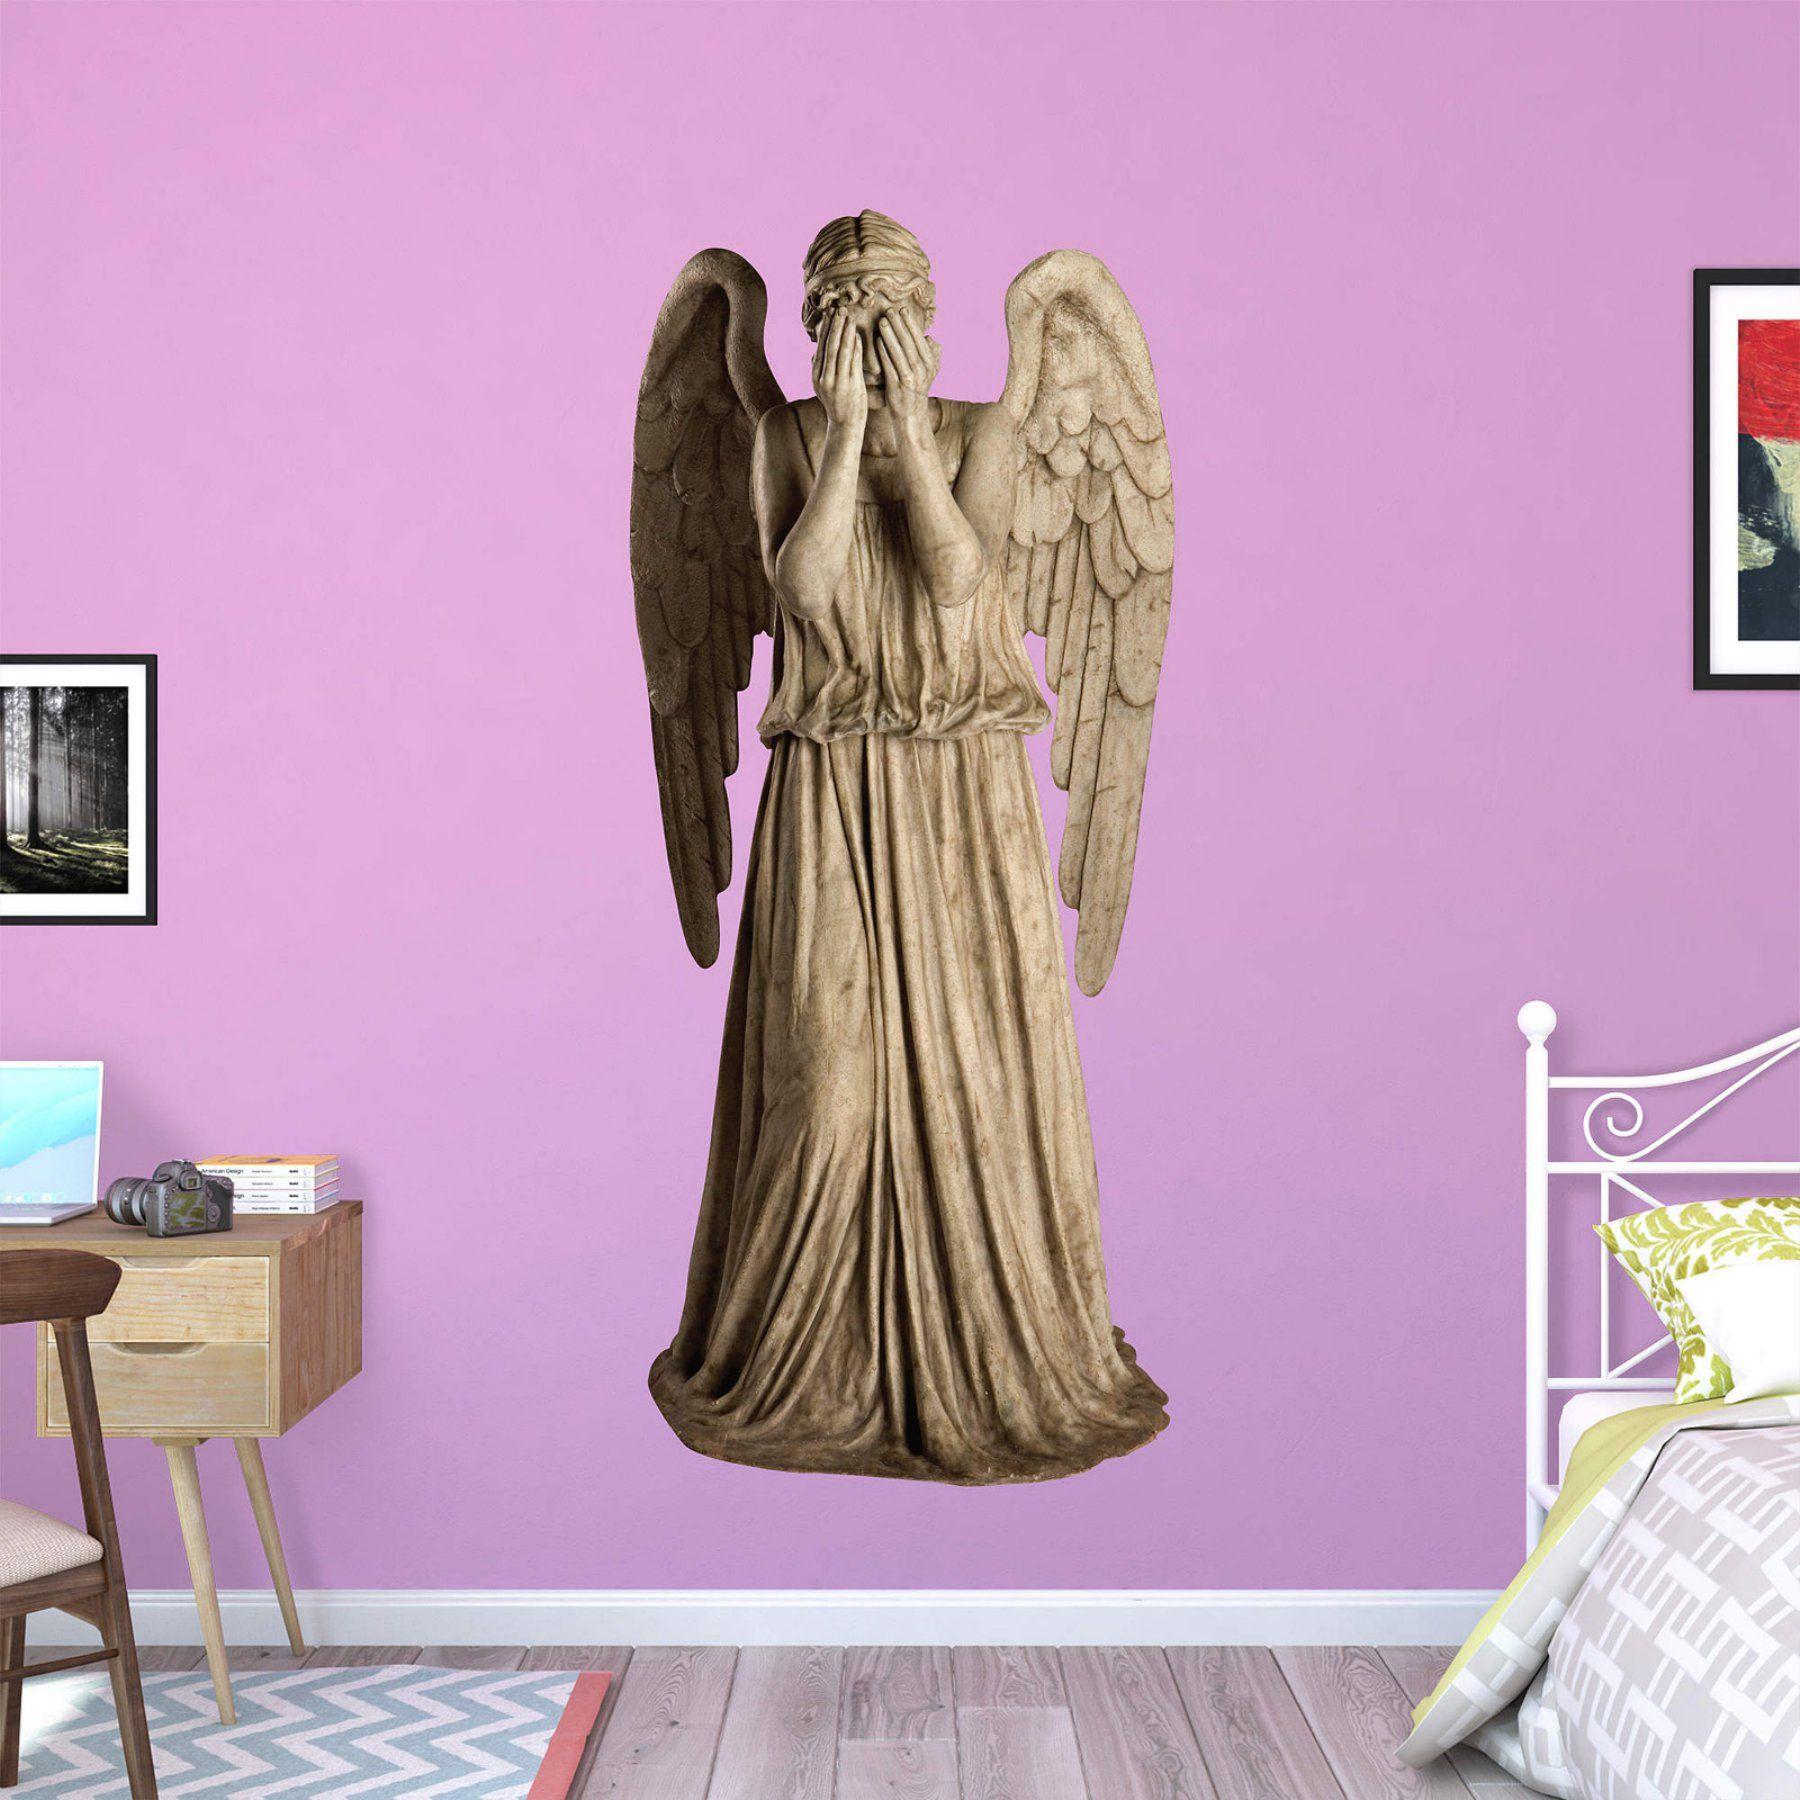 Fathead Doctor Who Weeping Angel Wall Decal - 1120-00005 | Wall ...